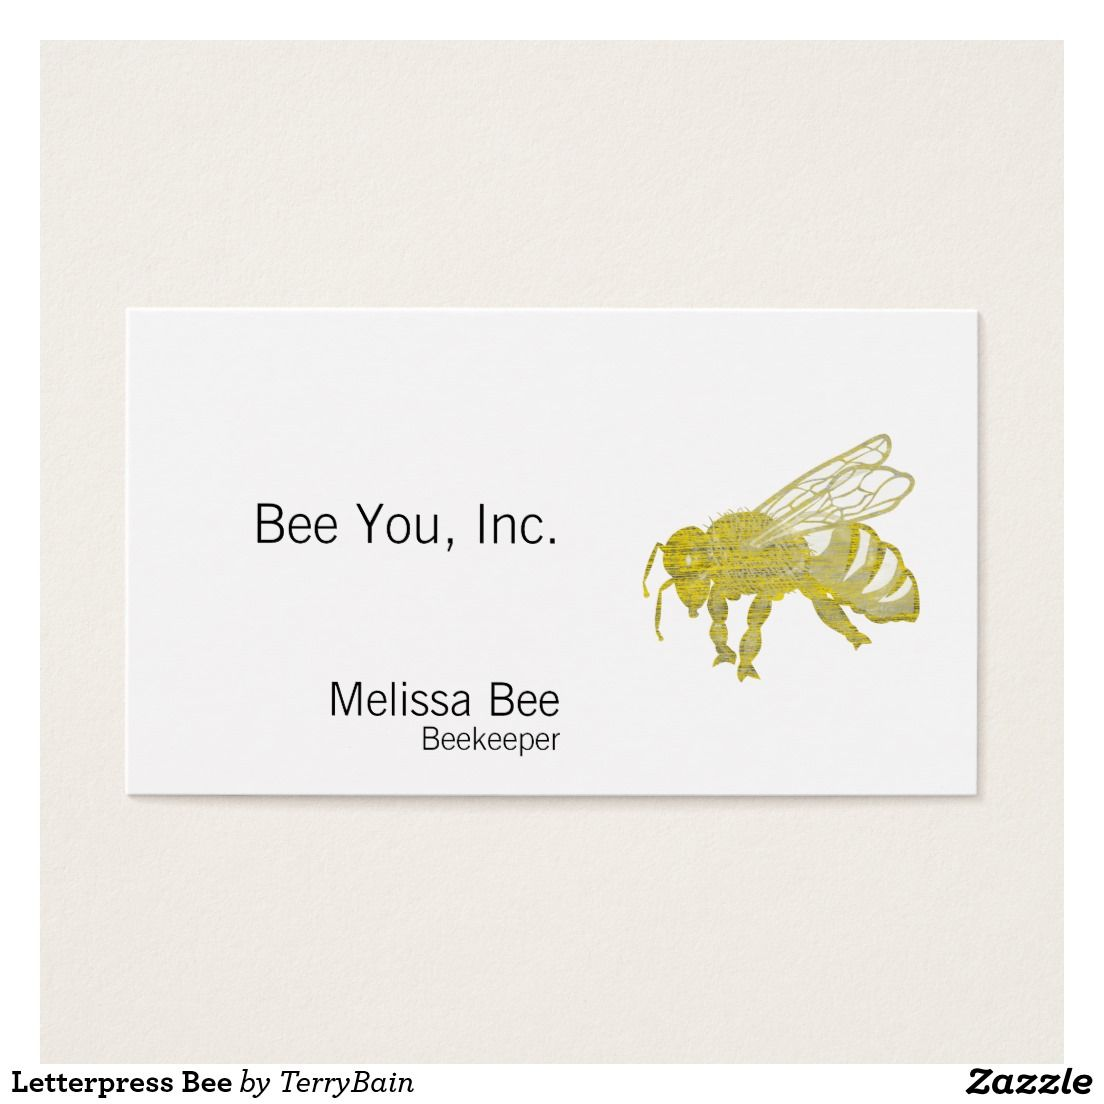 Letterpress Bee Business Card | Letterpresses